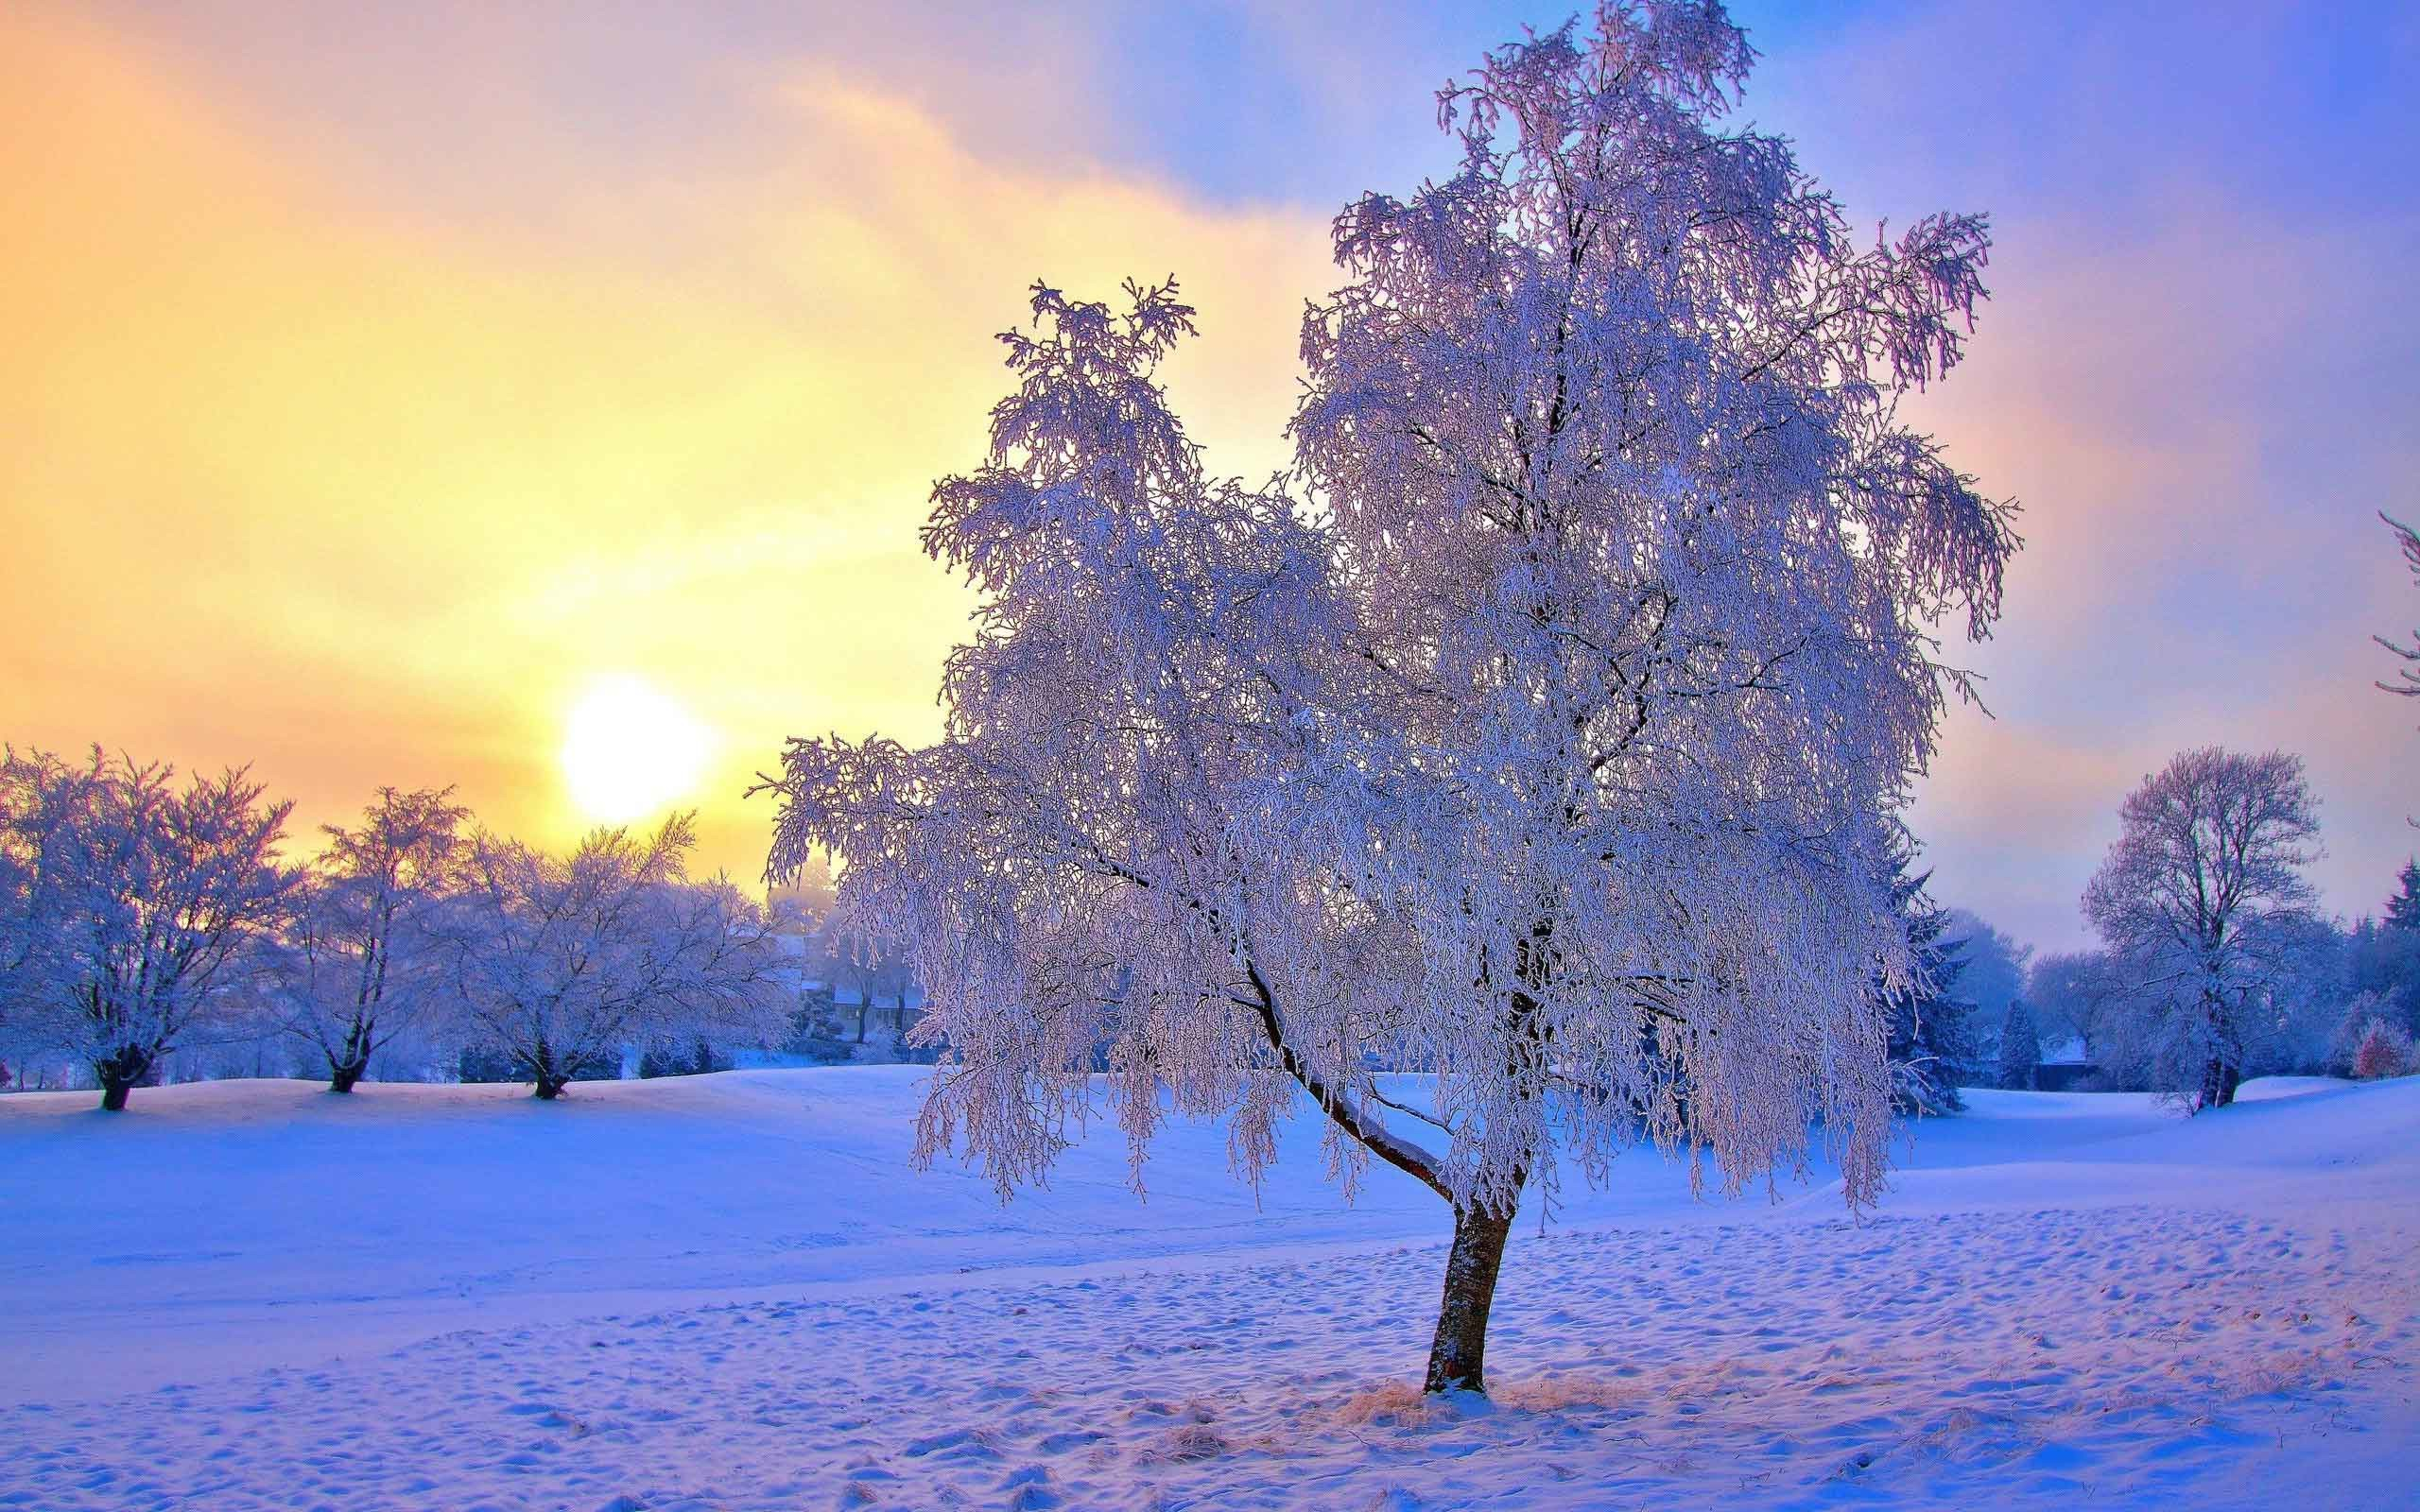 winter landscape wallpapers 68 images